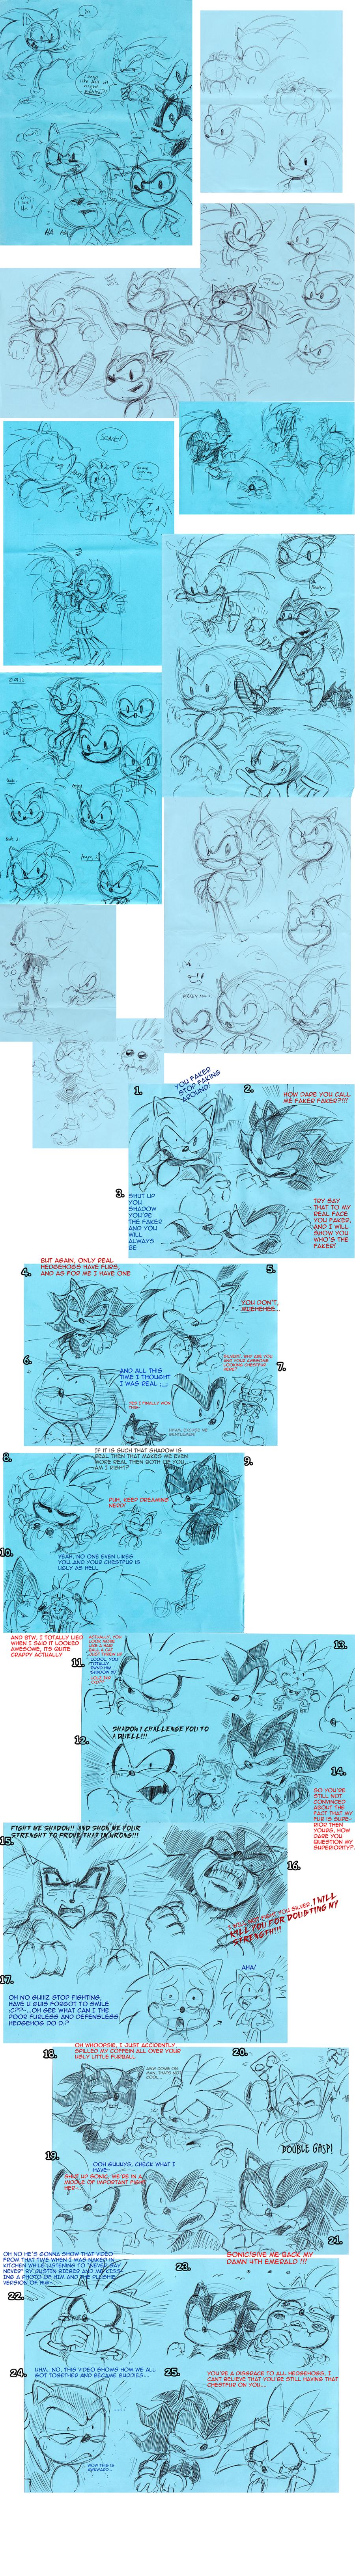 A new Sonic art?? by missyuna